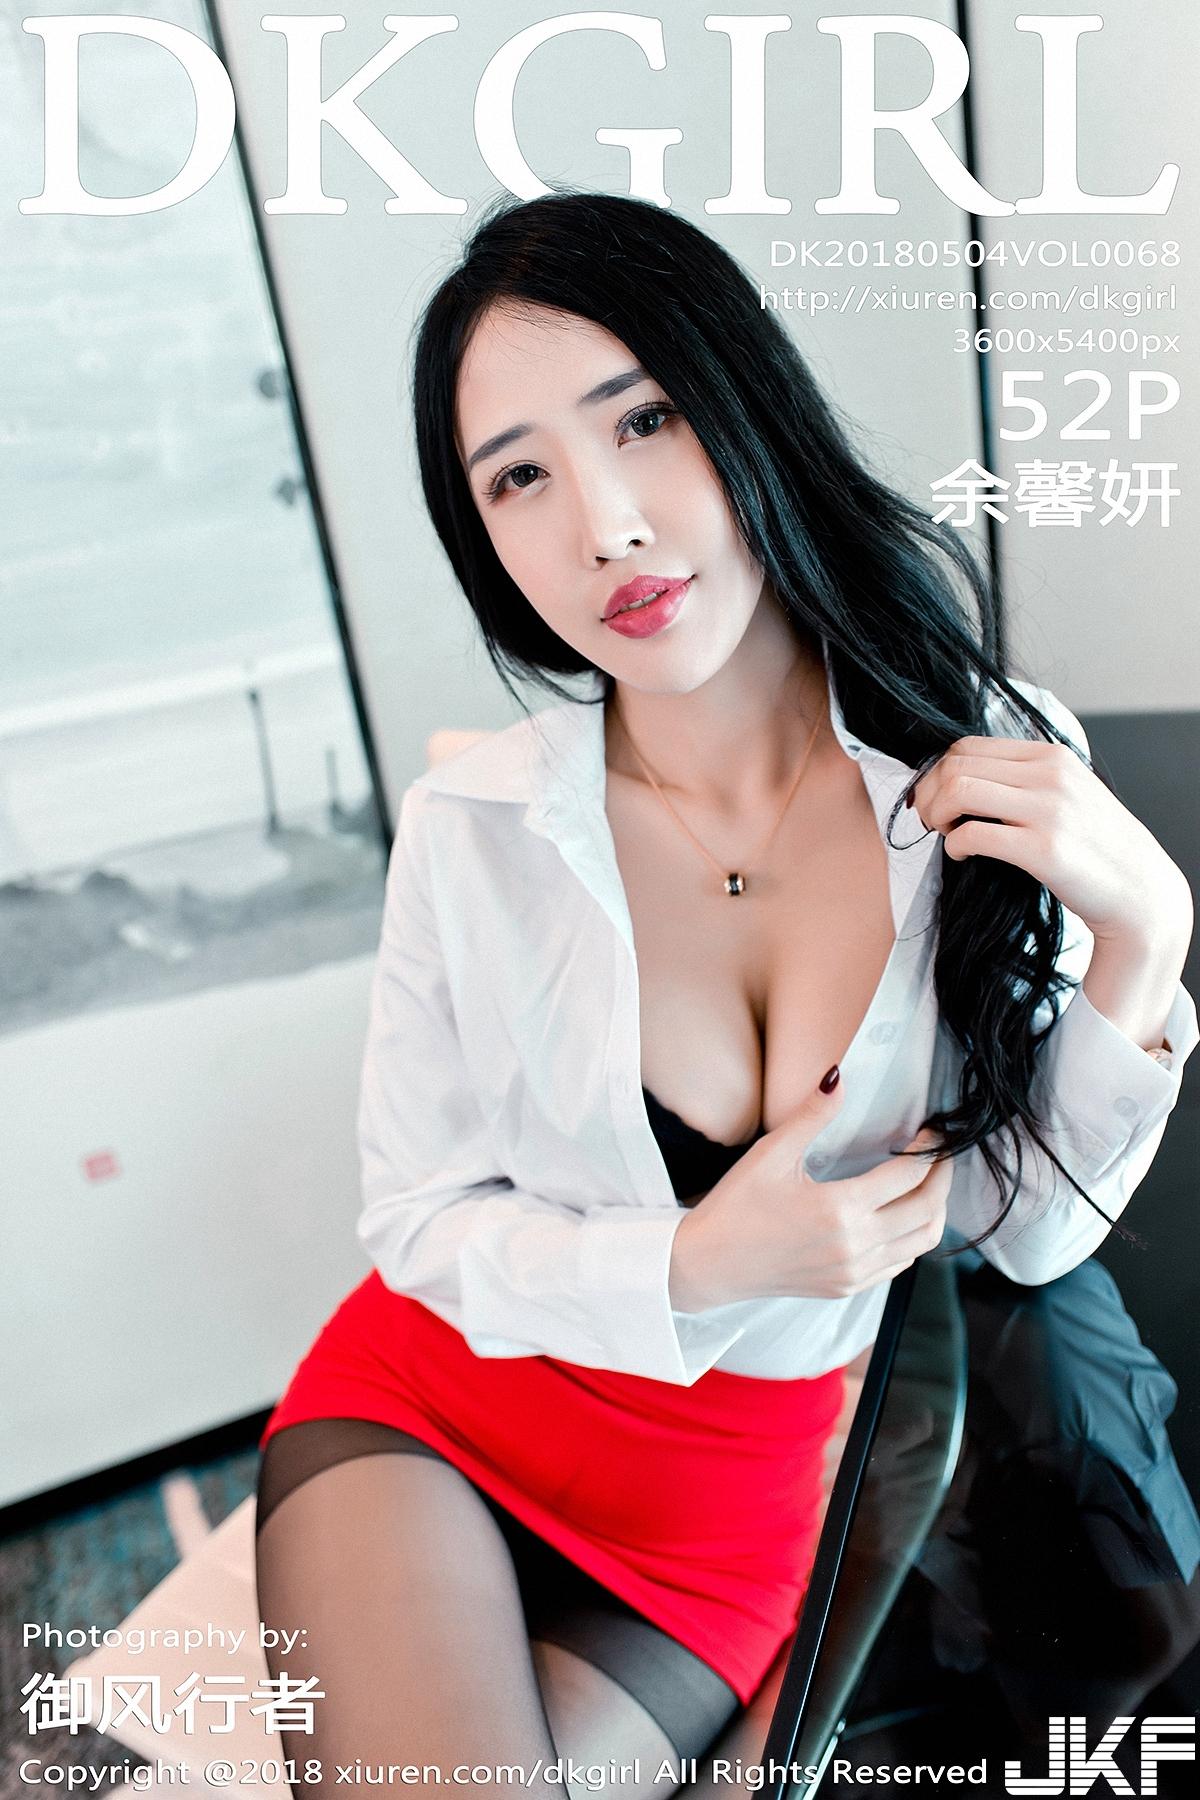 【DKGirl御女郎系列】2018.05.04 VOL.068 余馨妍 性感寫真【53P】 - 貼圖 - 絲襪美腿 -